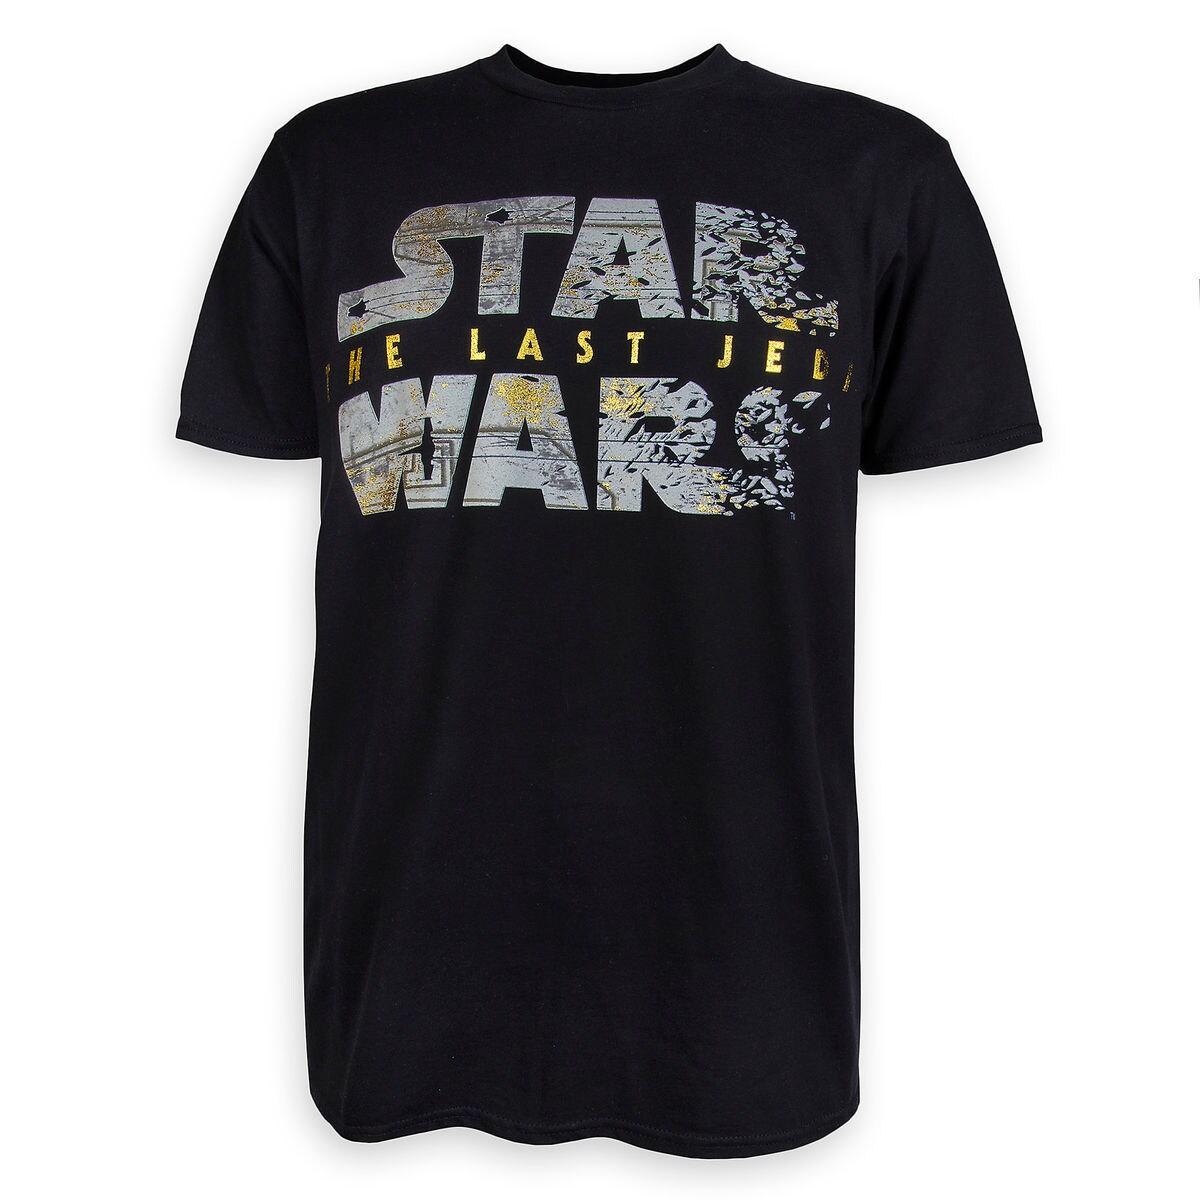 Star Wars: The Last Jedi Logo T-Shirt for Men | shopDisney